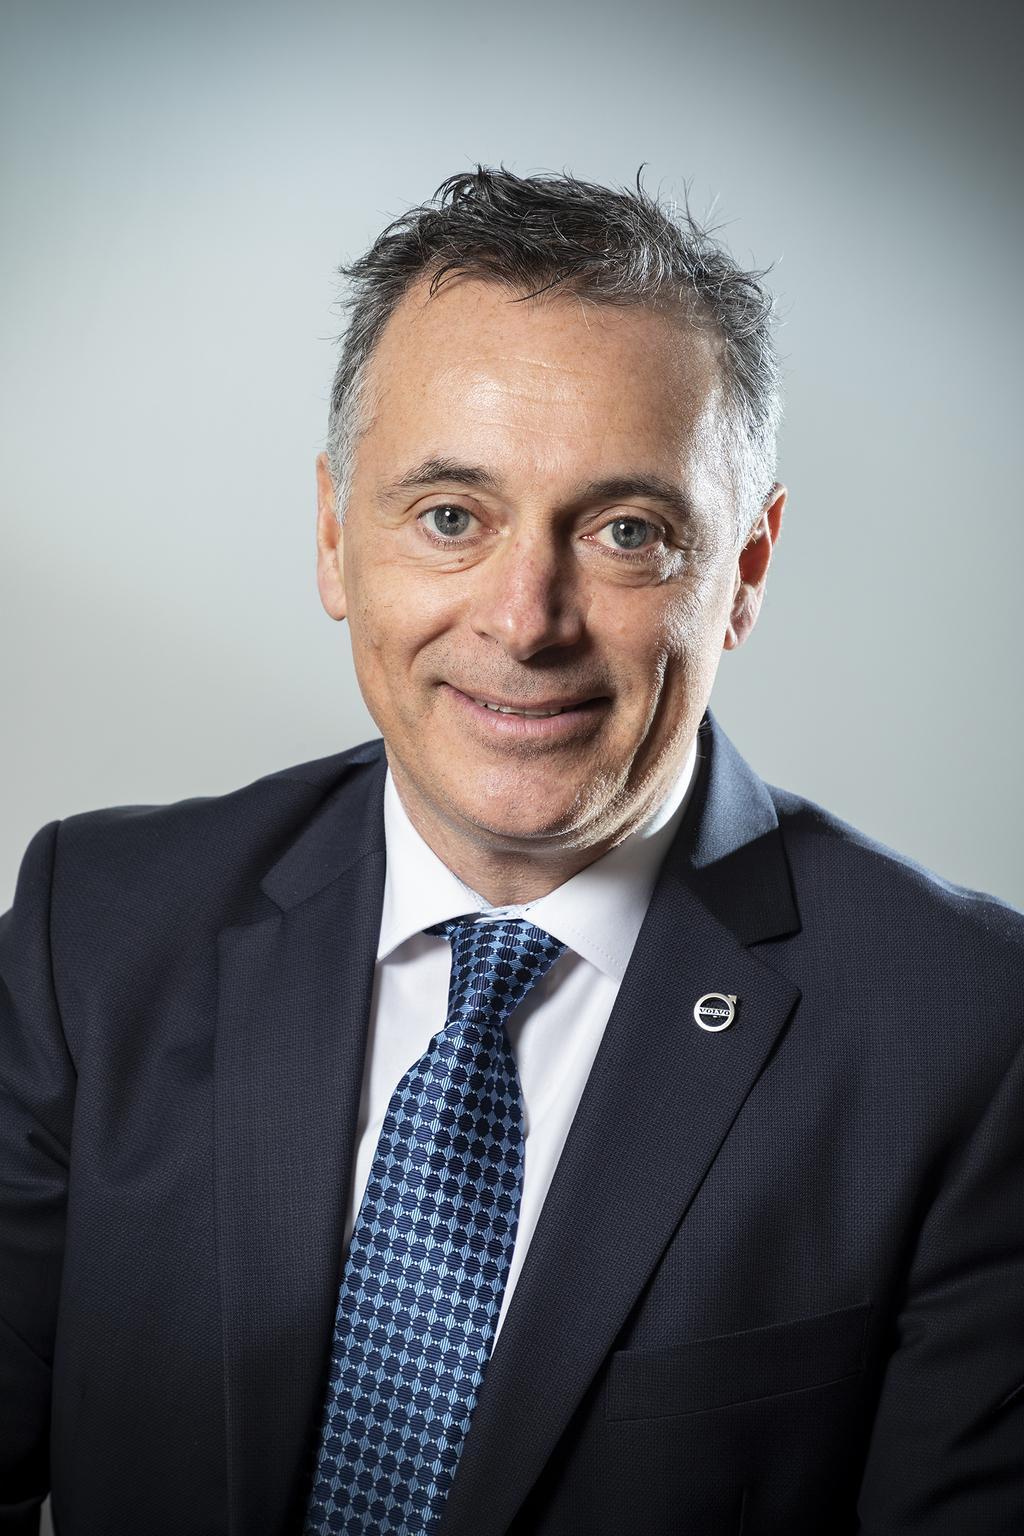 Robert Grozdanovski